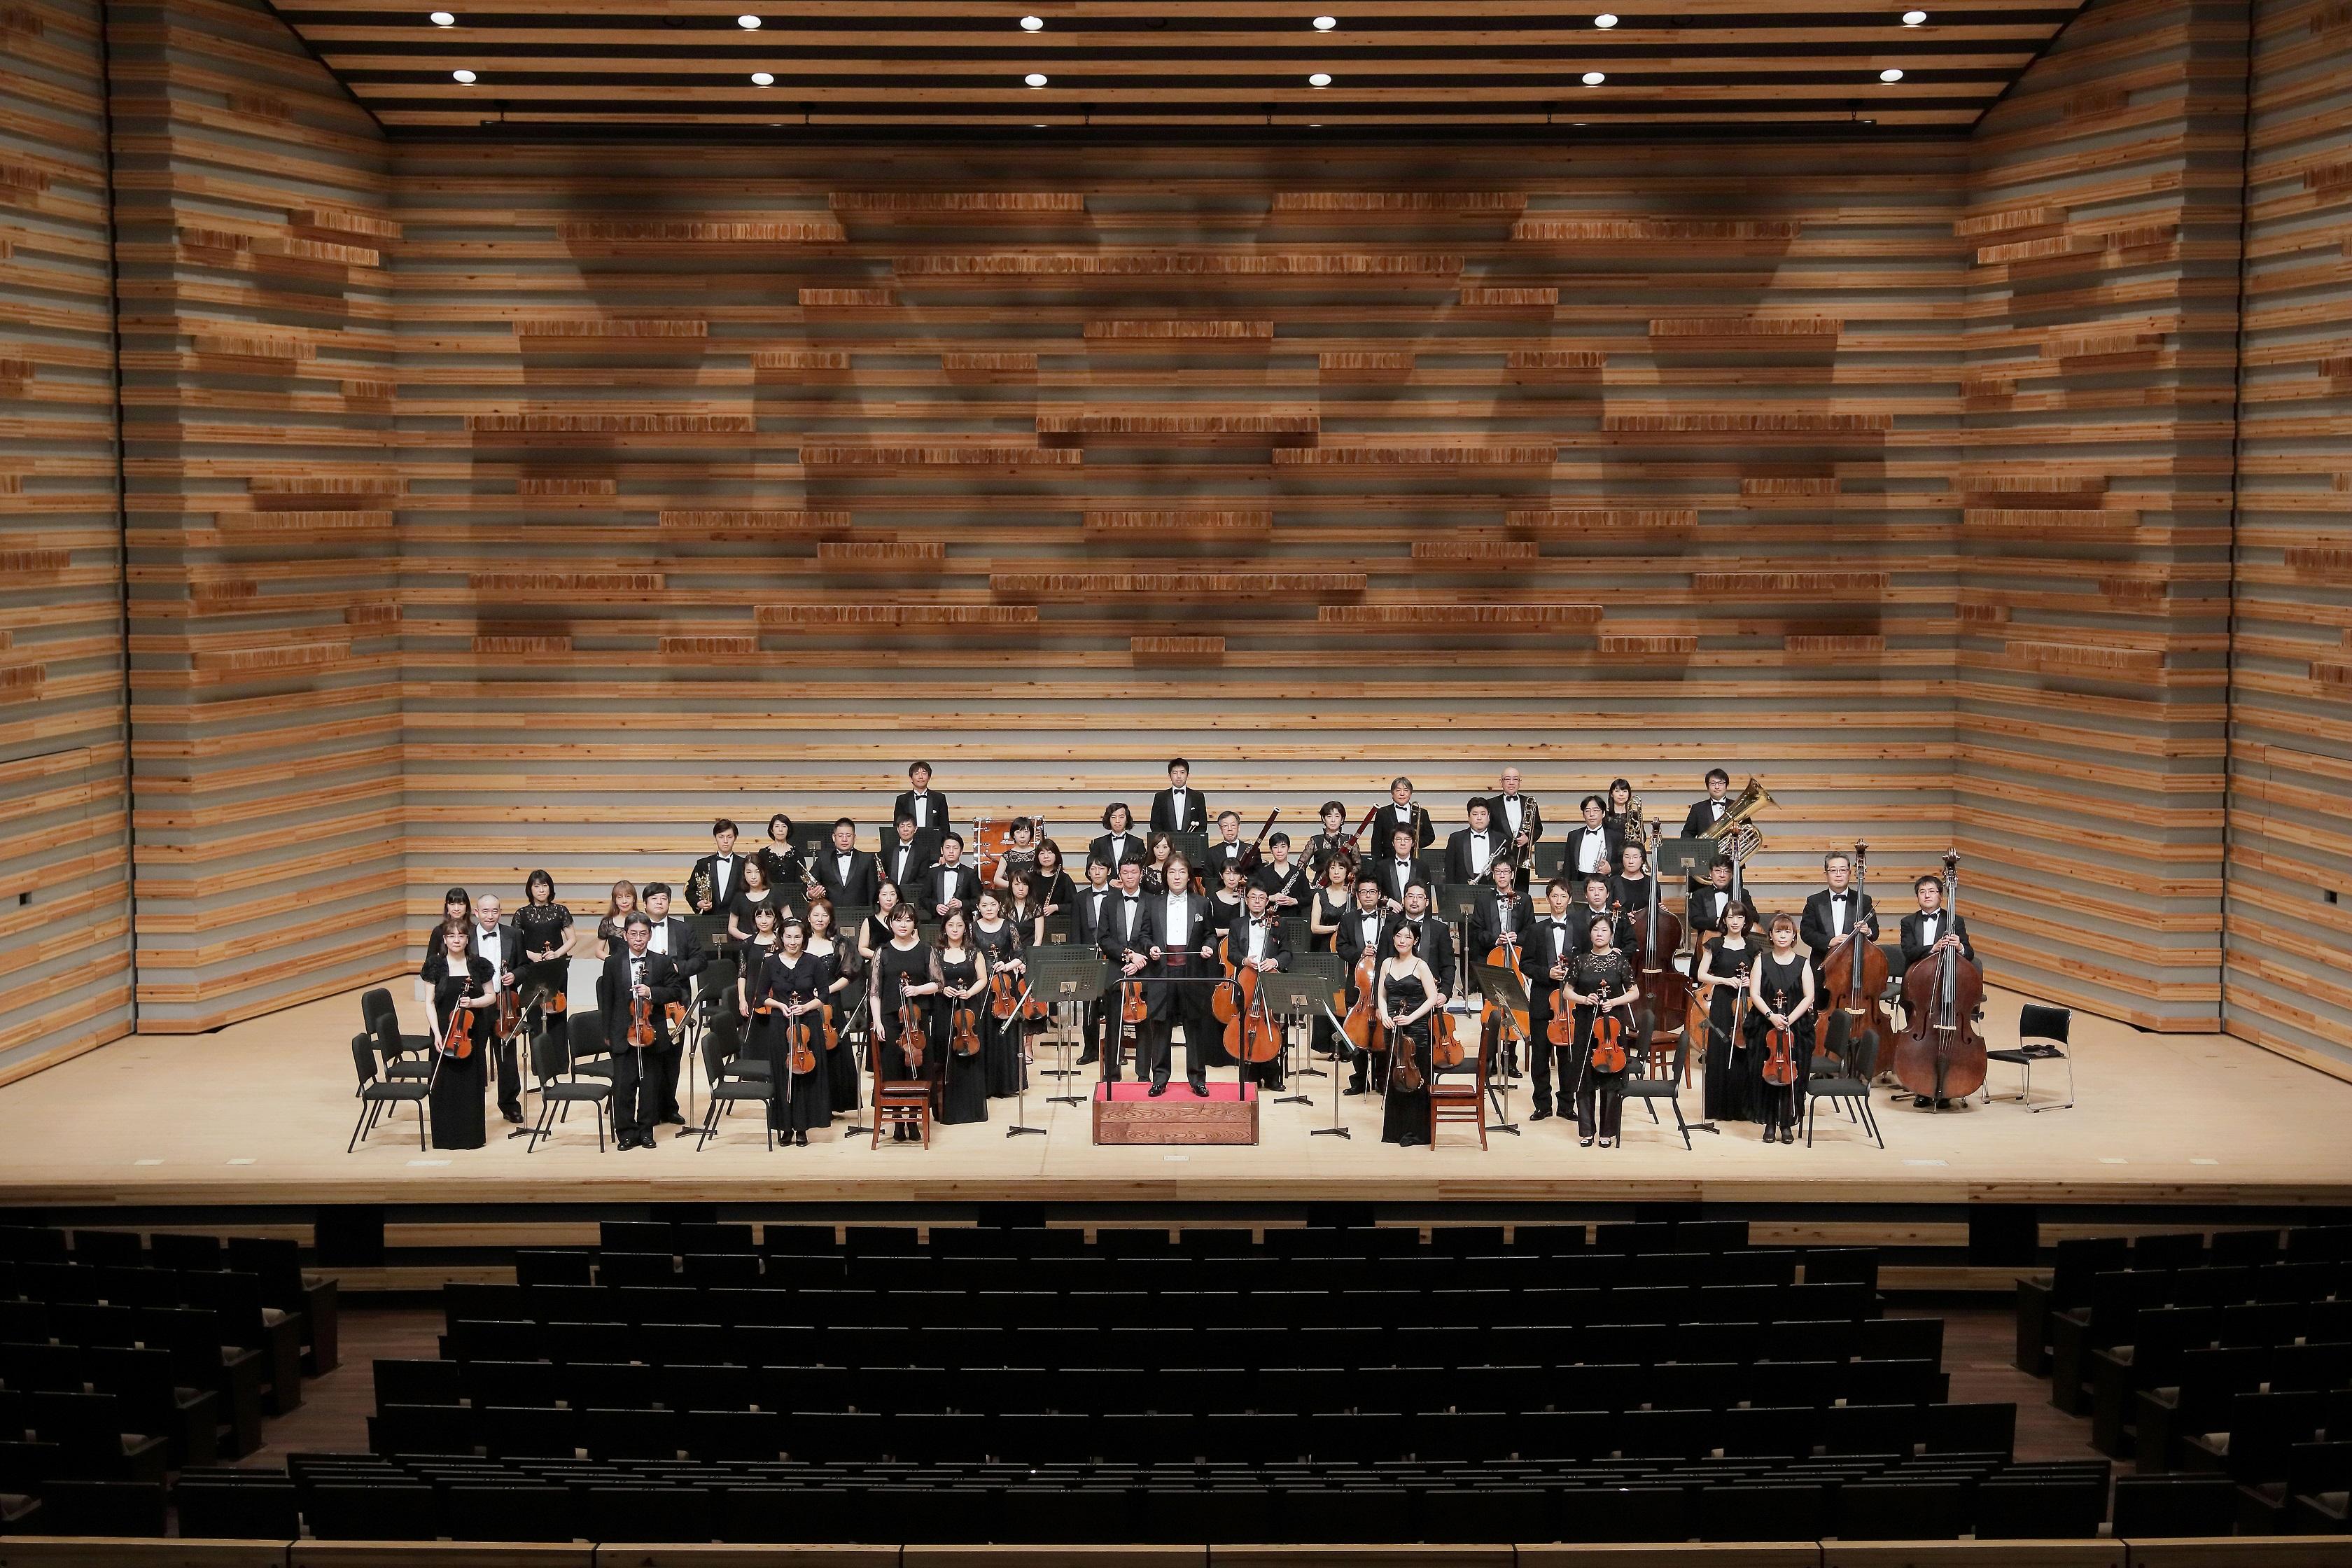 Japan Century Symphony Orchestra 日本センチュリー交響楽団